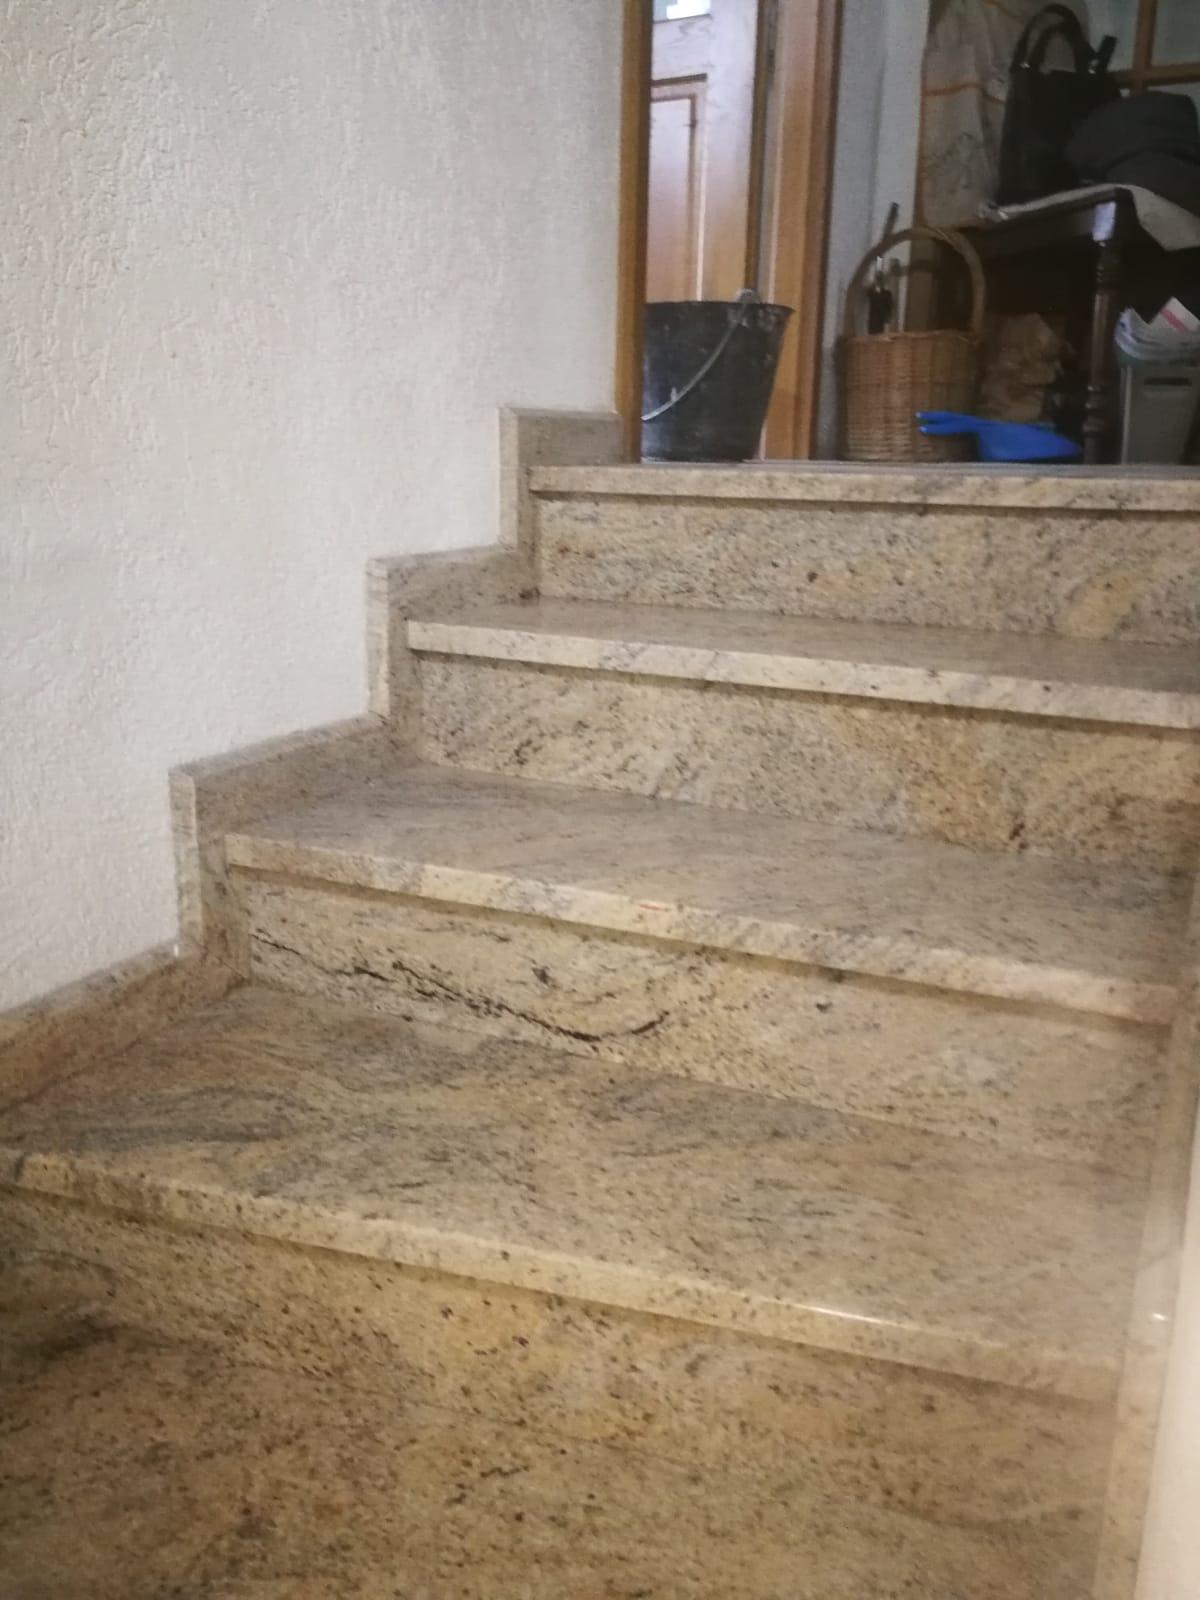 escalier interieur en pierre